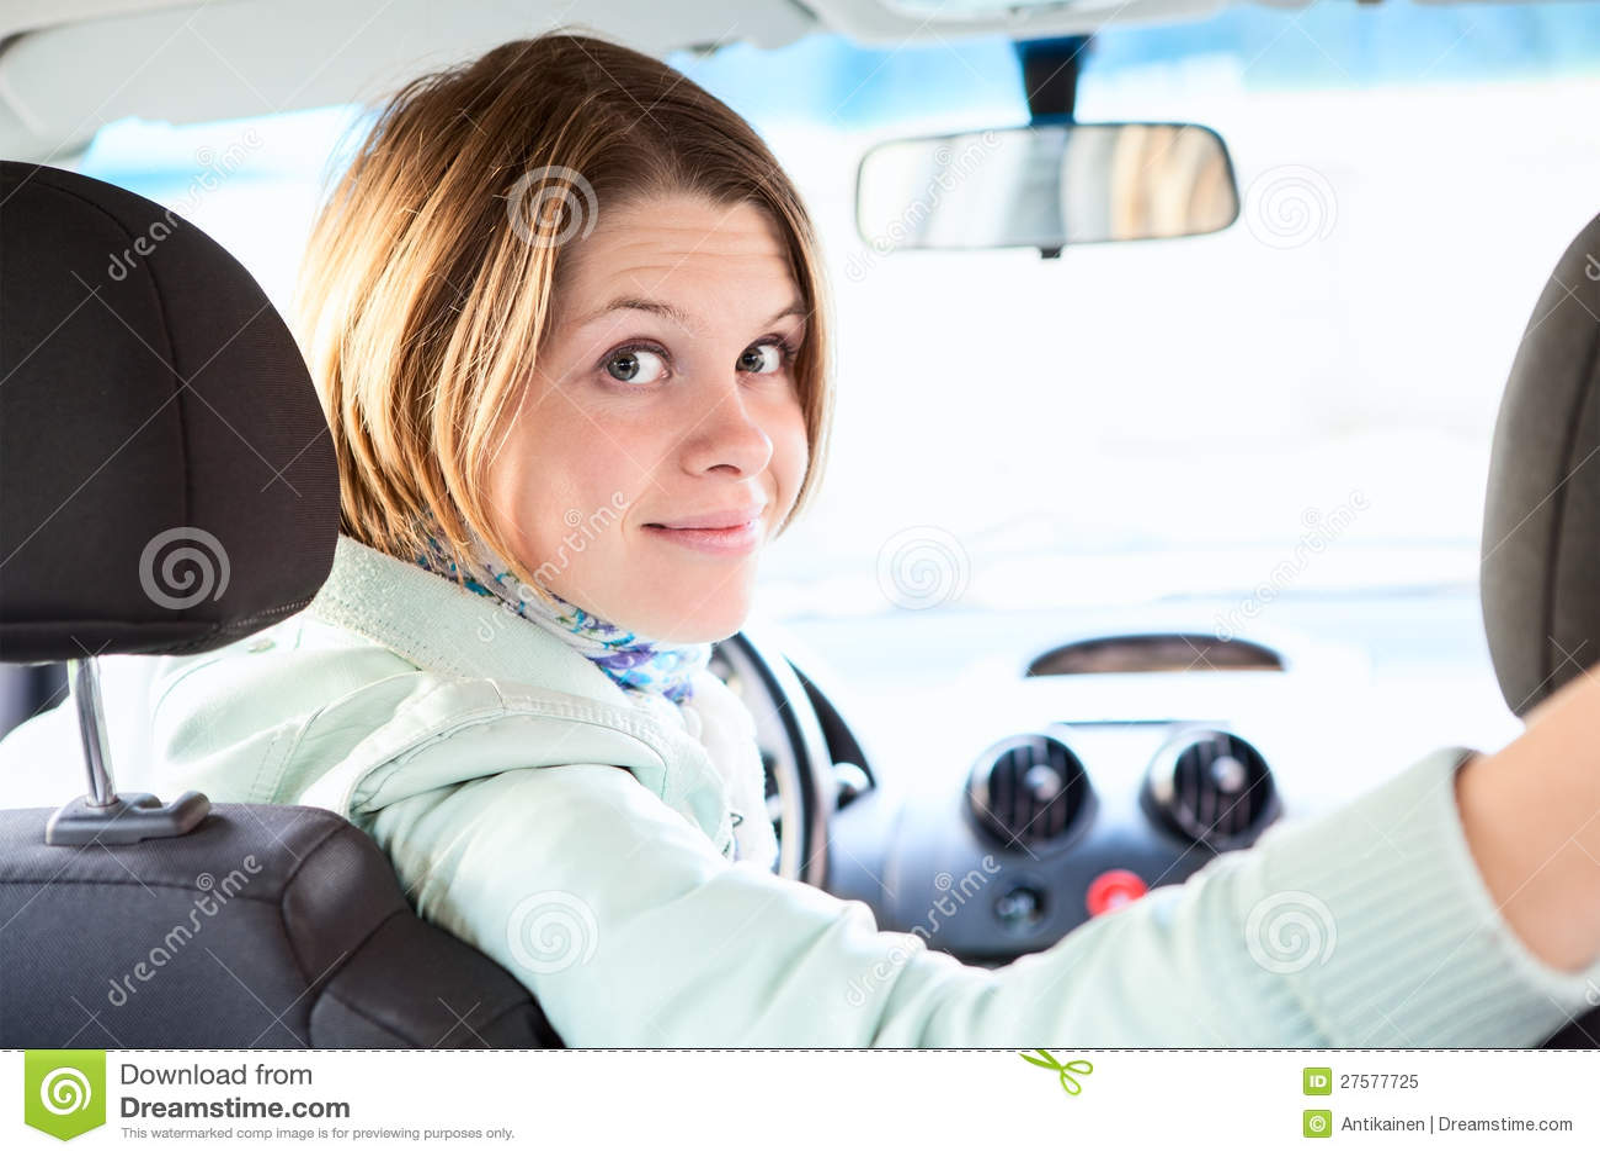 2932x2932 Pubg Android Game 4k Ipad Pro Retina Display Hd: Joyful Woman Inside Of Car Looking Back Royalty Free Stock